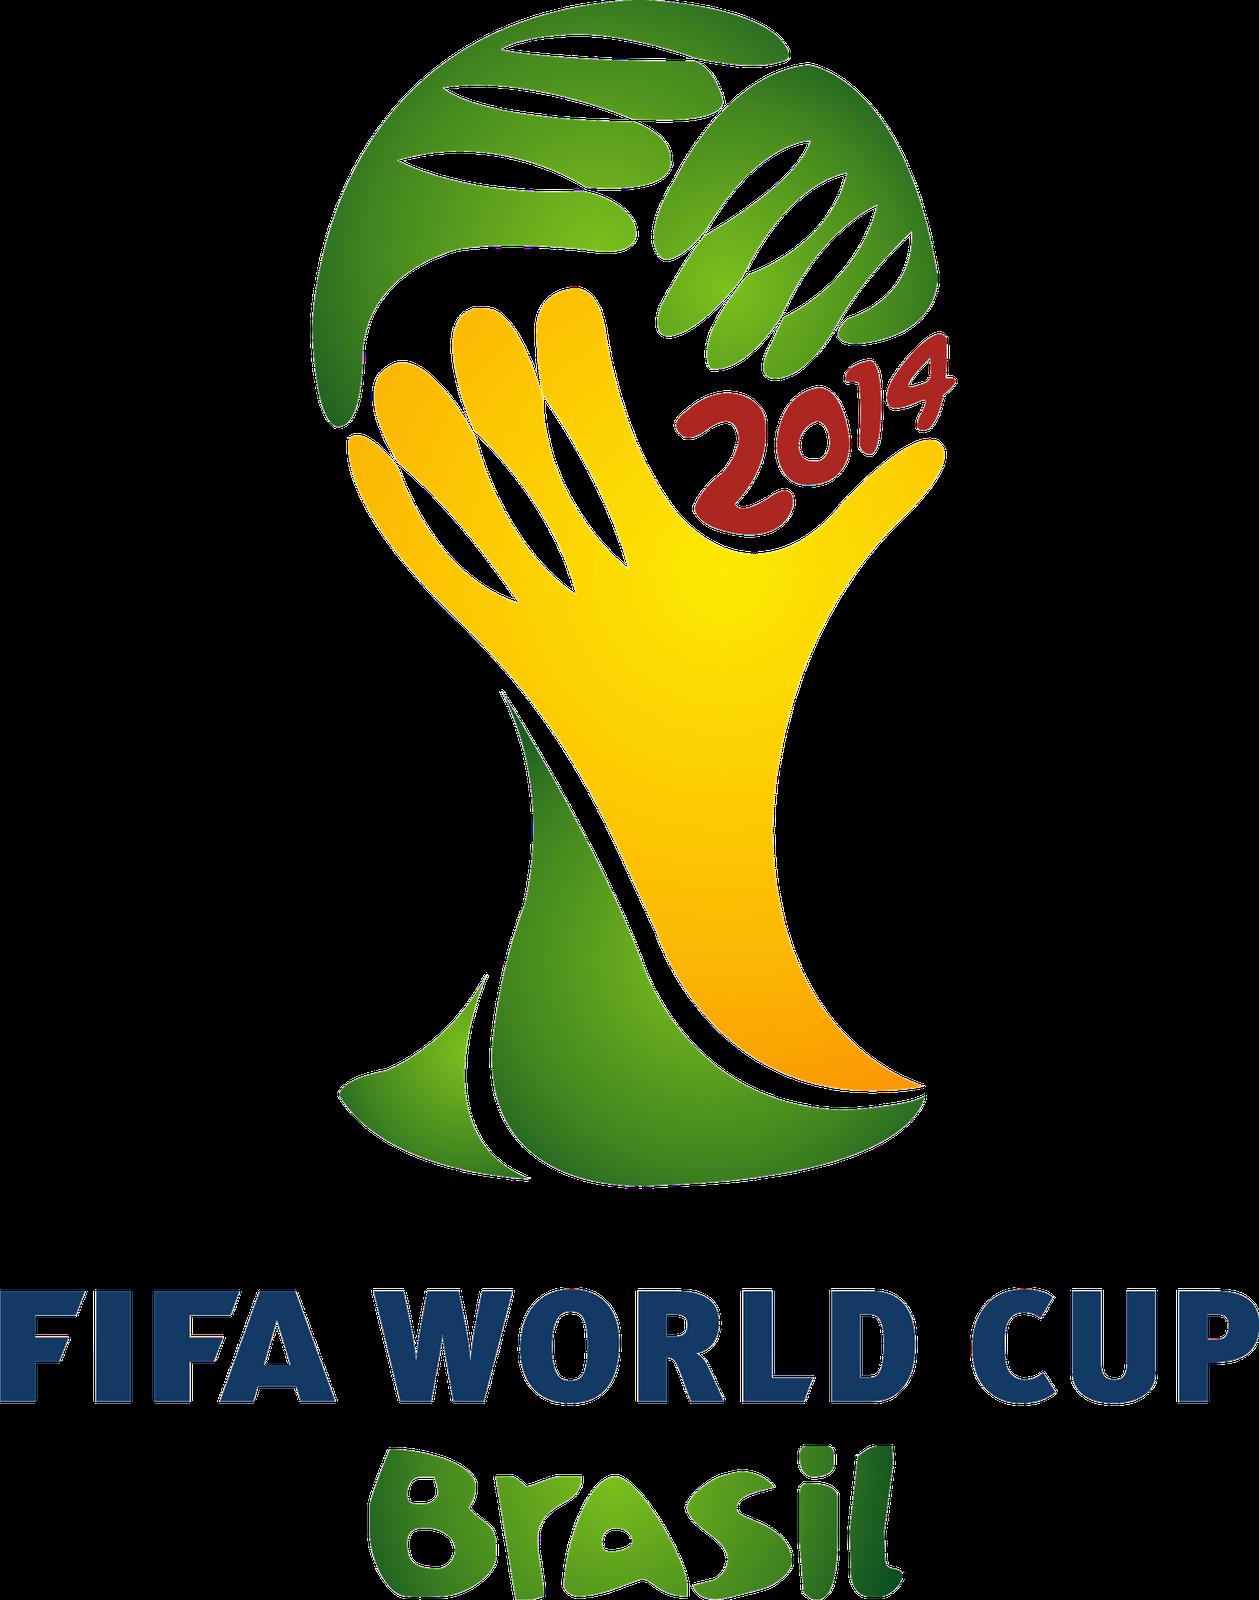 Resultado de imagen para brasil 2014